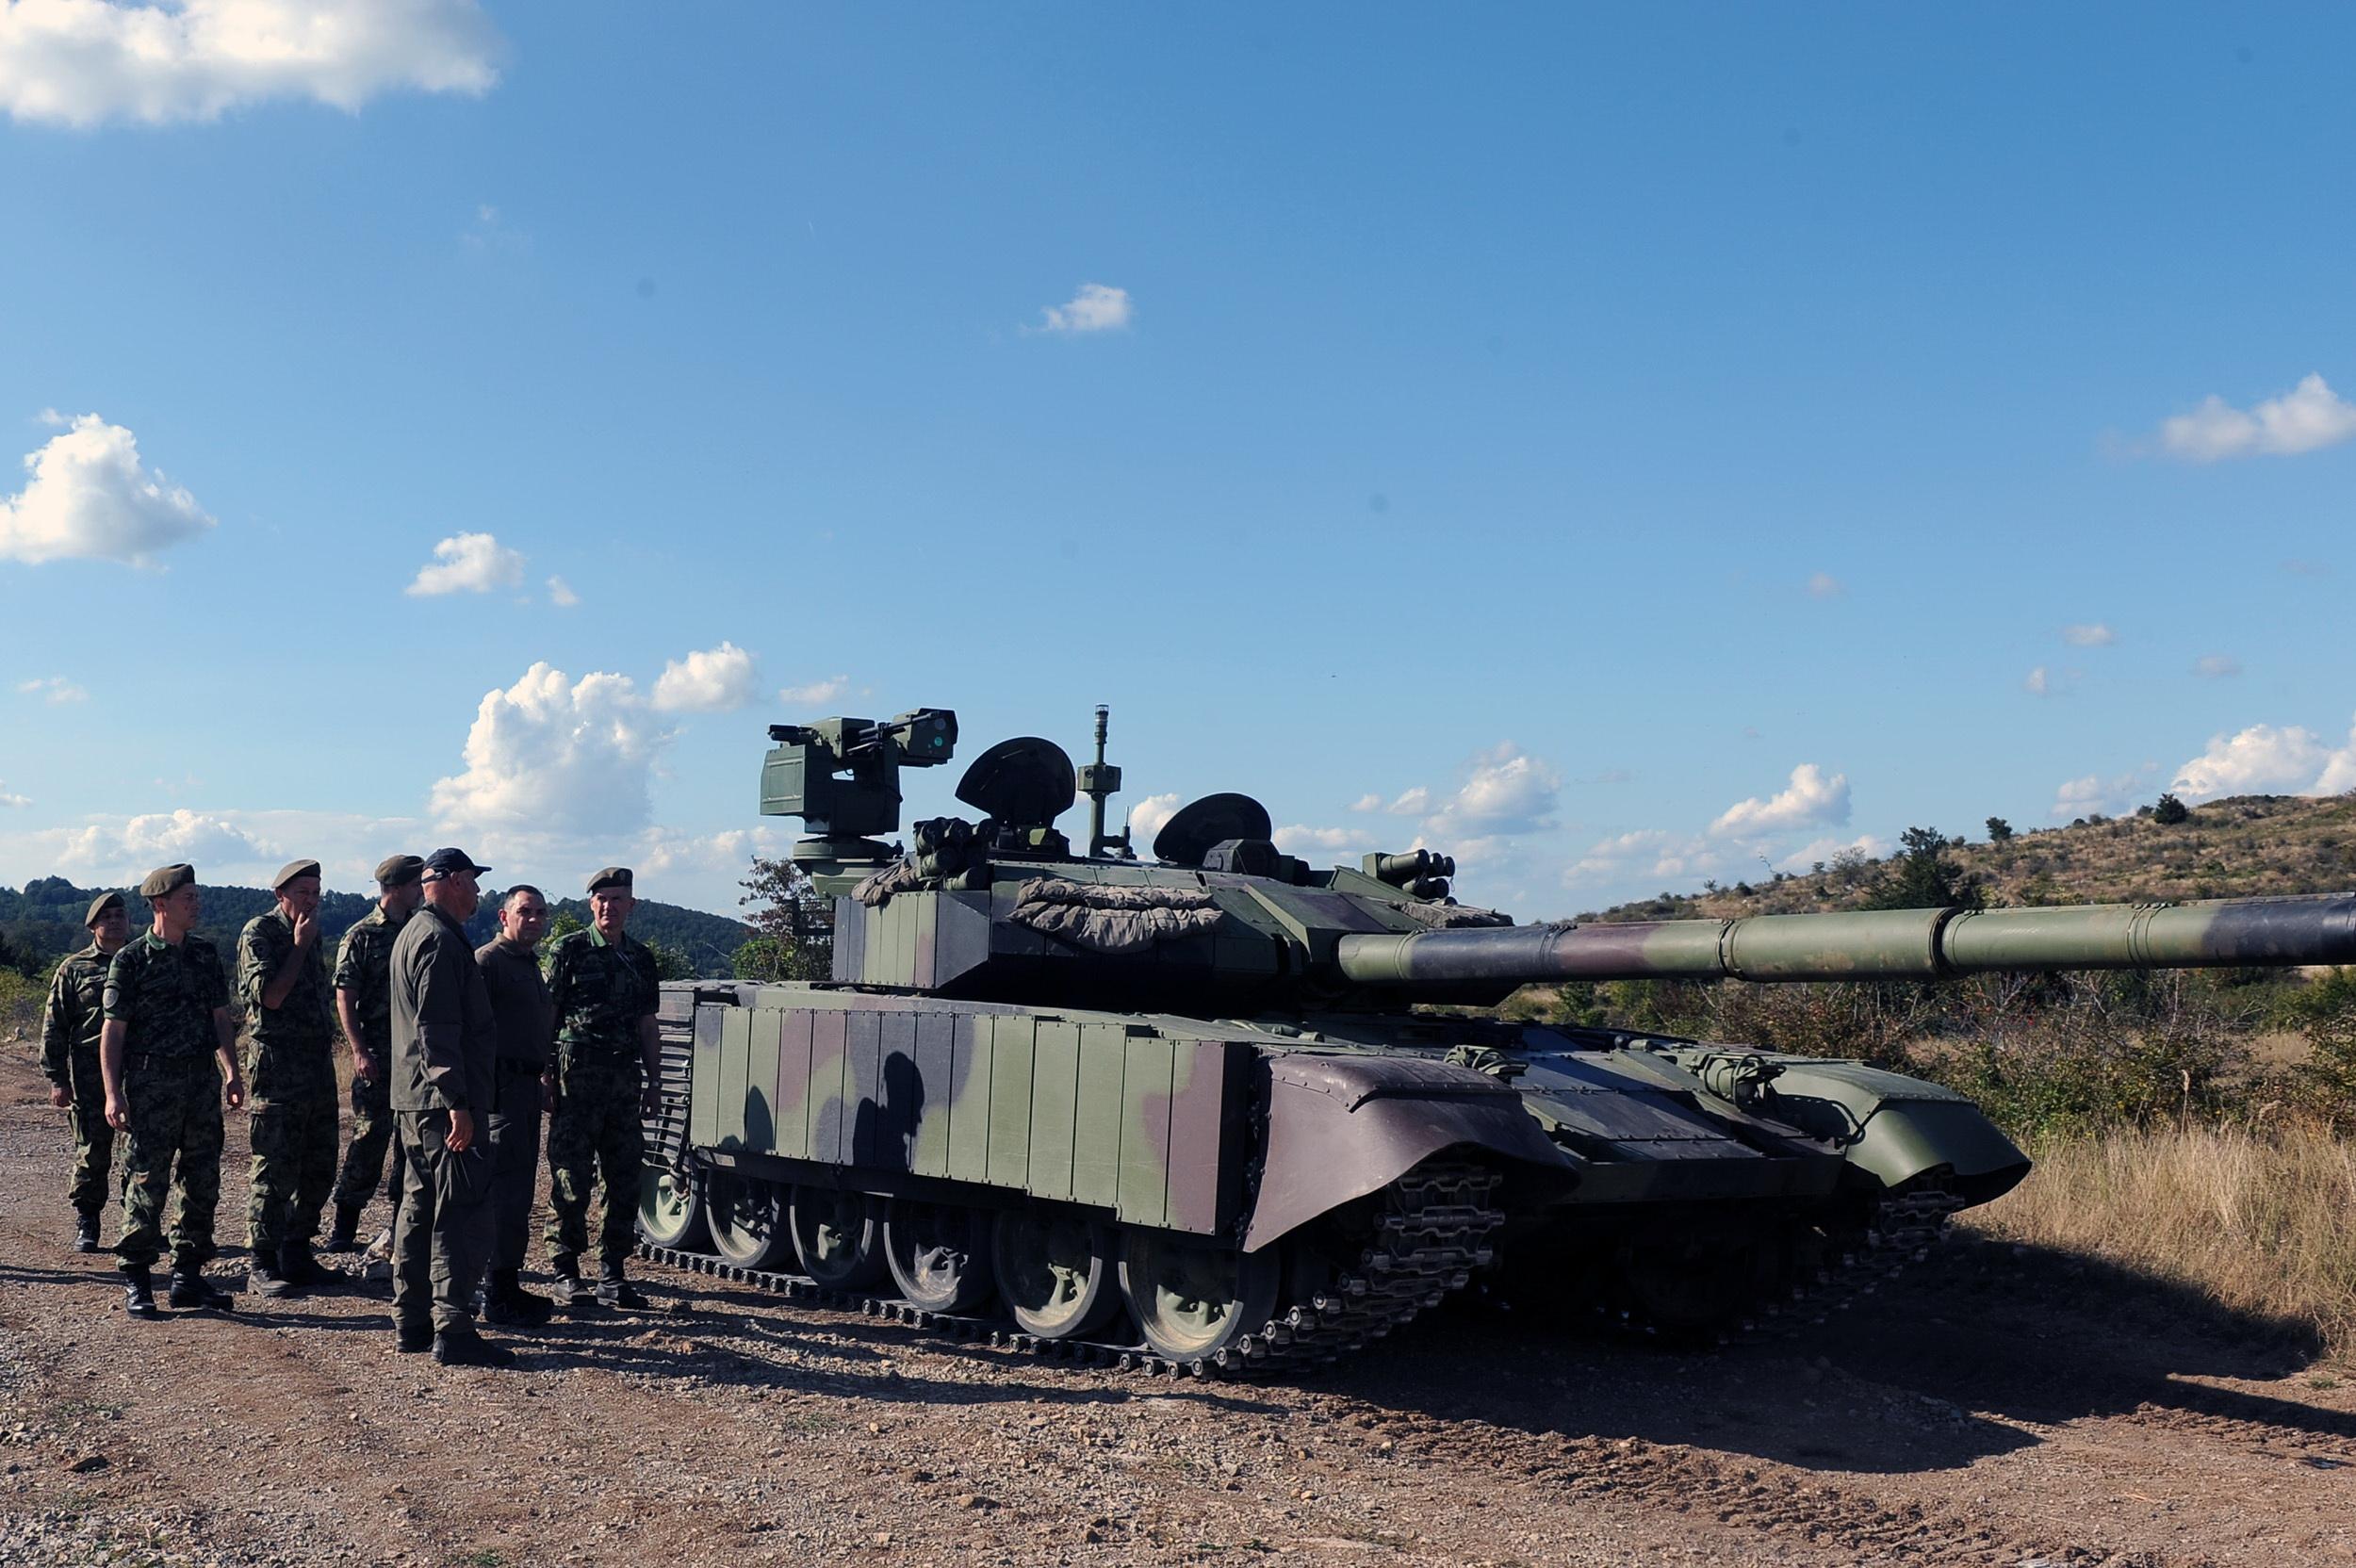 Srbija predstavila modernizirani M84 AS1 Serbian-ministry-of-defence-showcases-upgraded-m-84-as1-main-attle-tanks-1